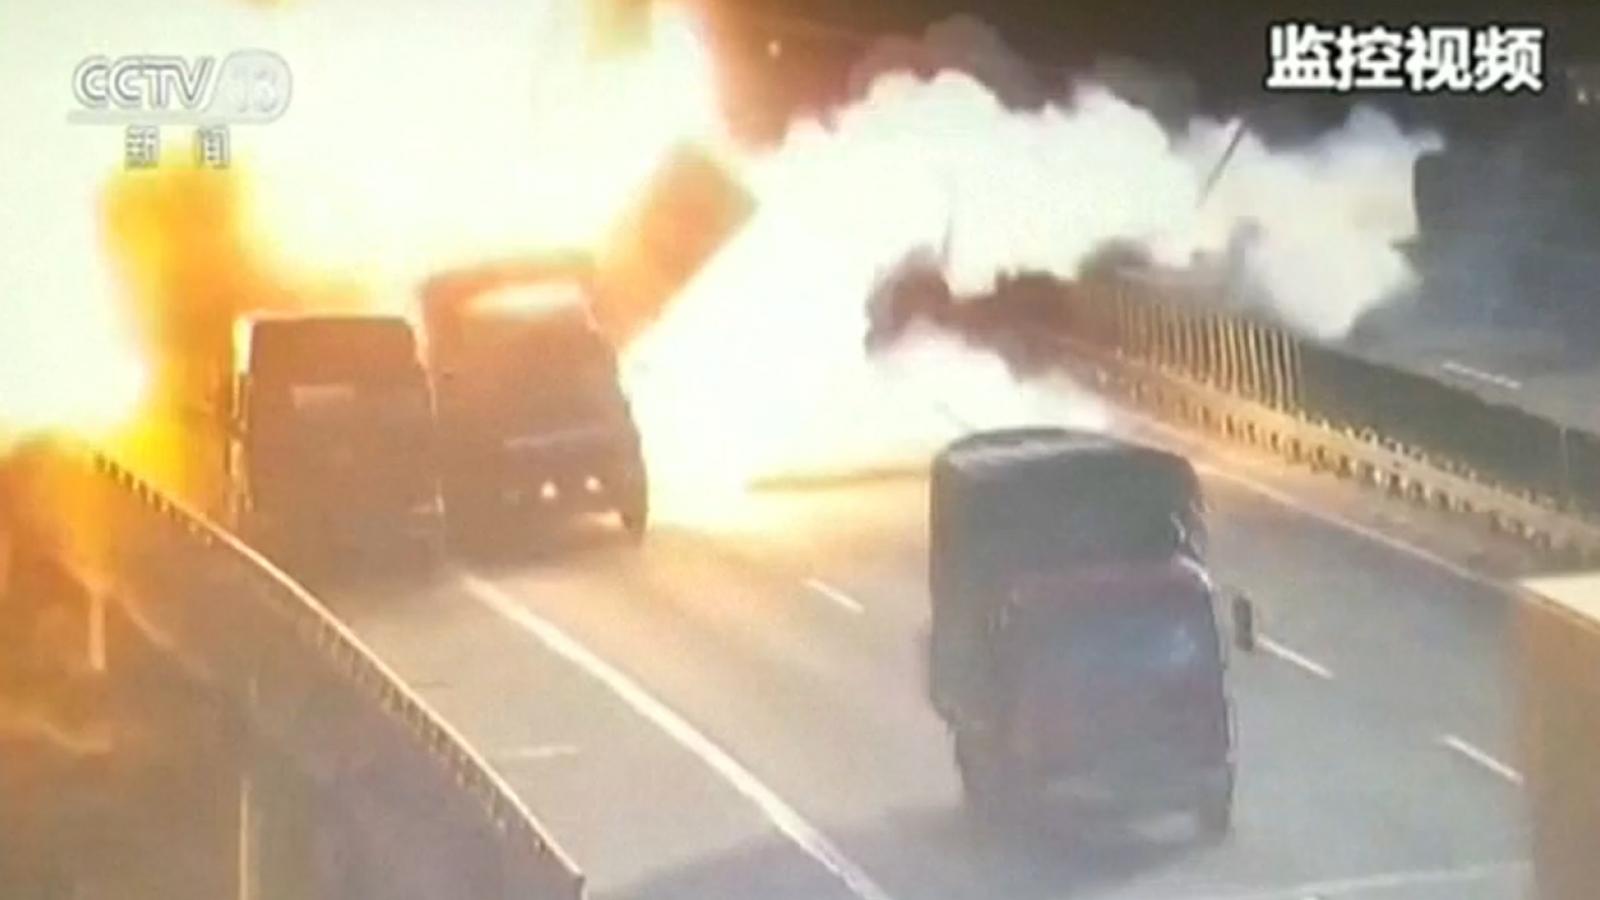 dramatic-movie-style-truck-blast-captured-on-cctv-in-china